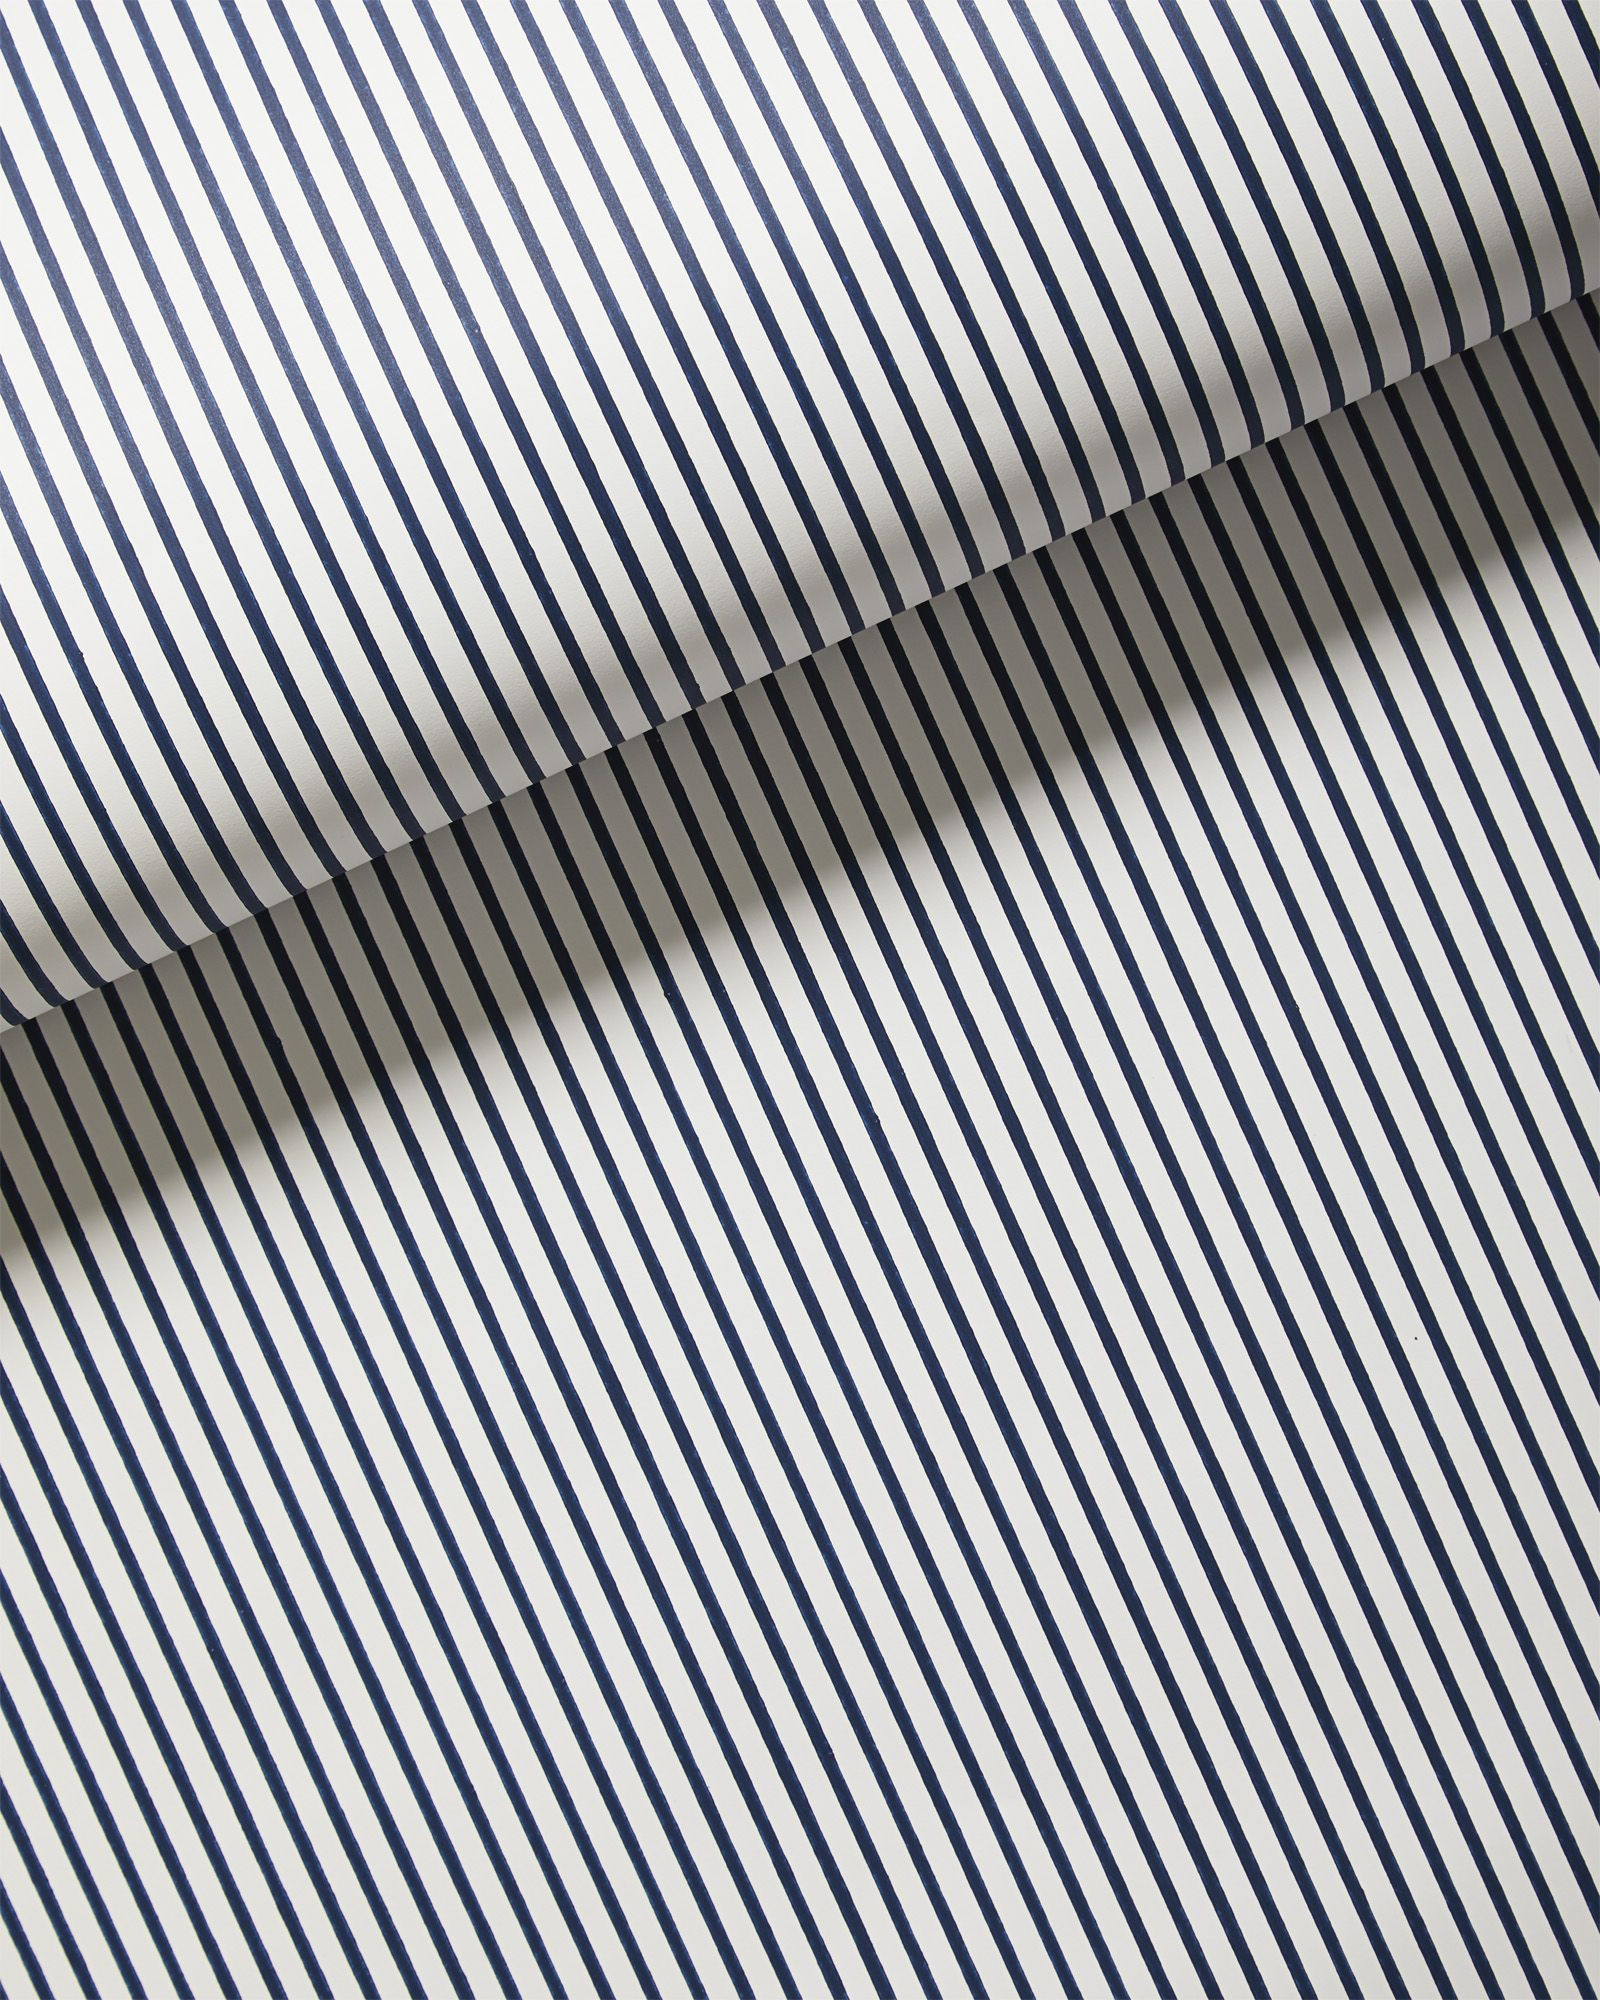 Oxford Stripe Wallpaper Striped Wallpaper Striped